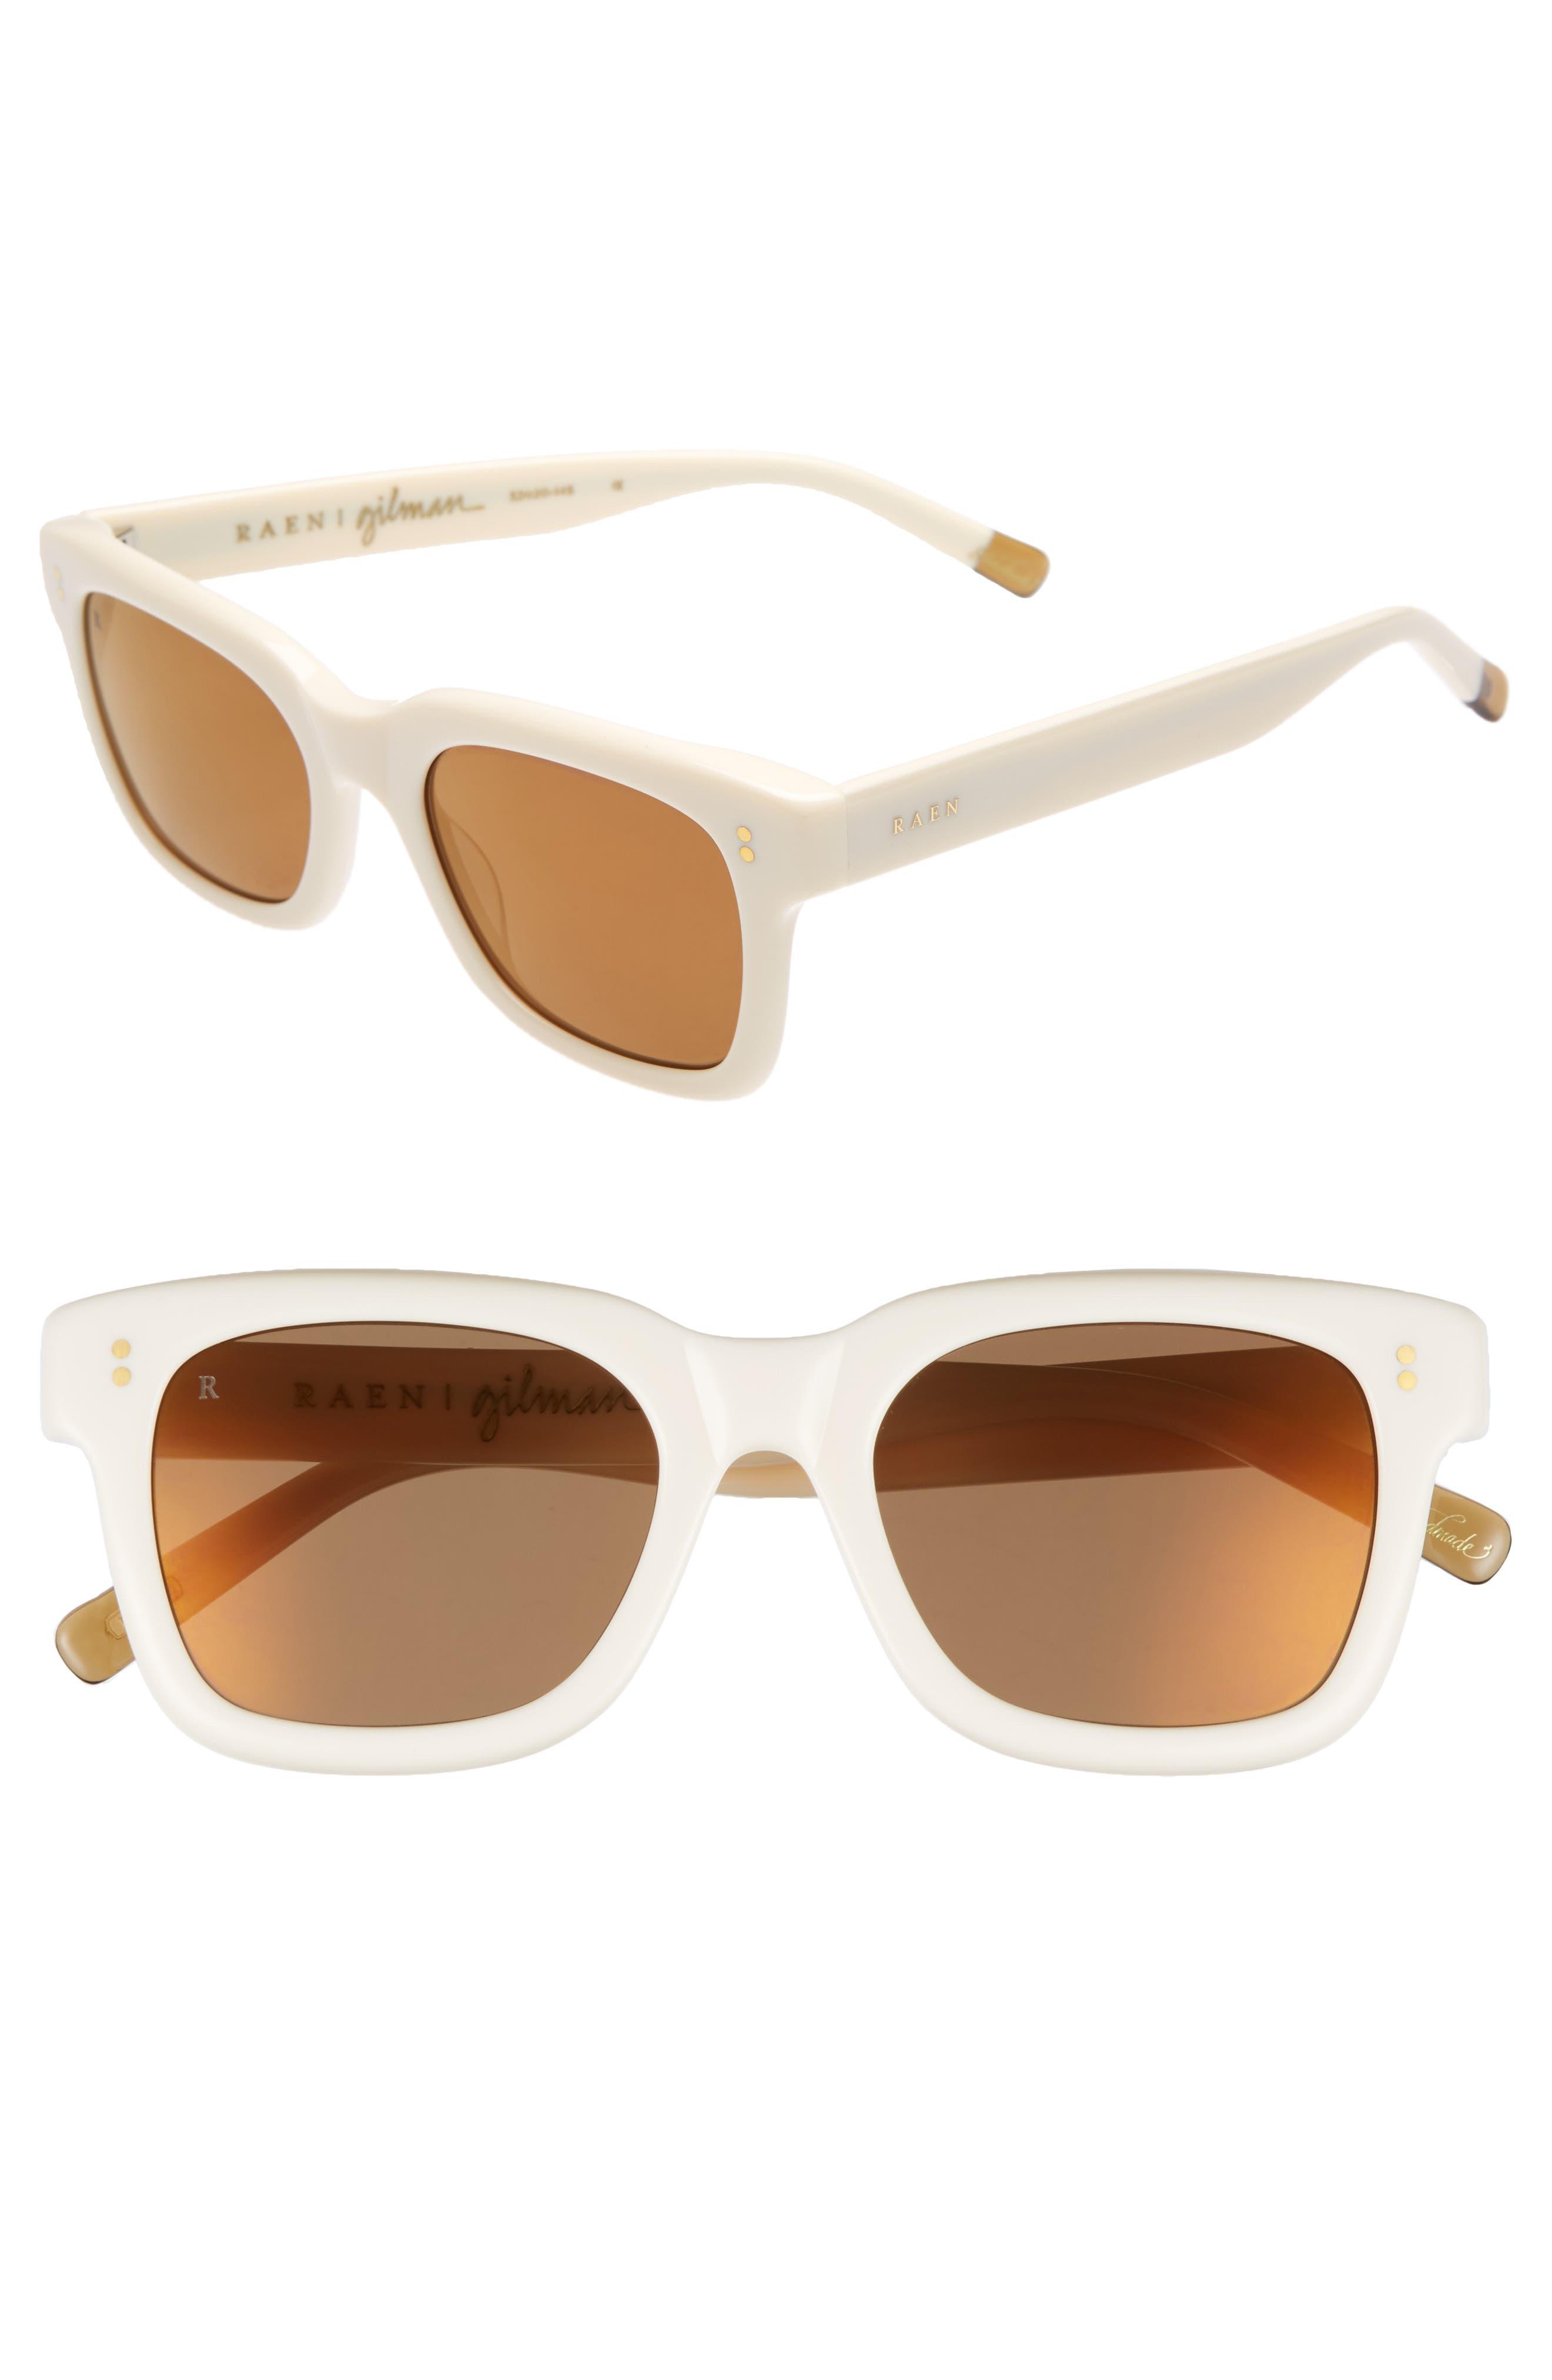 Gilman 52mm Mirrored Polarized Sunglasses,                             Main thumbnail 1, color,                             650